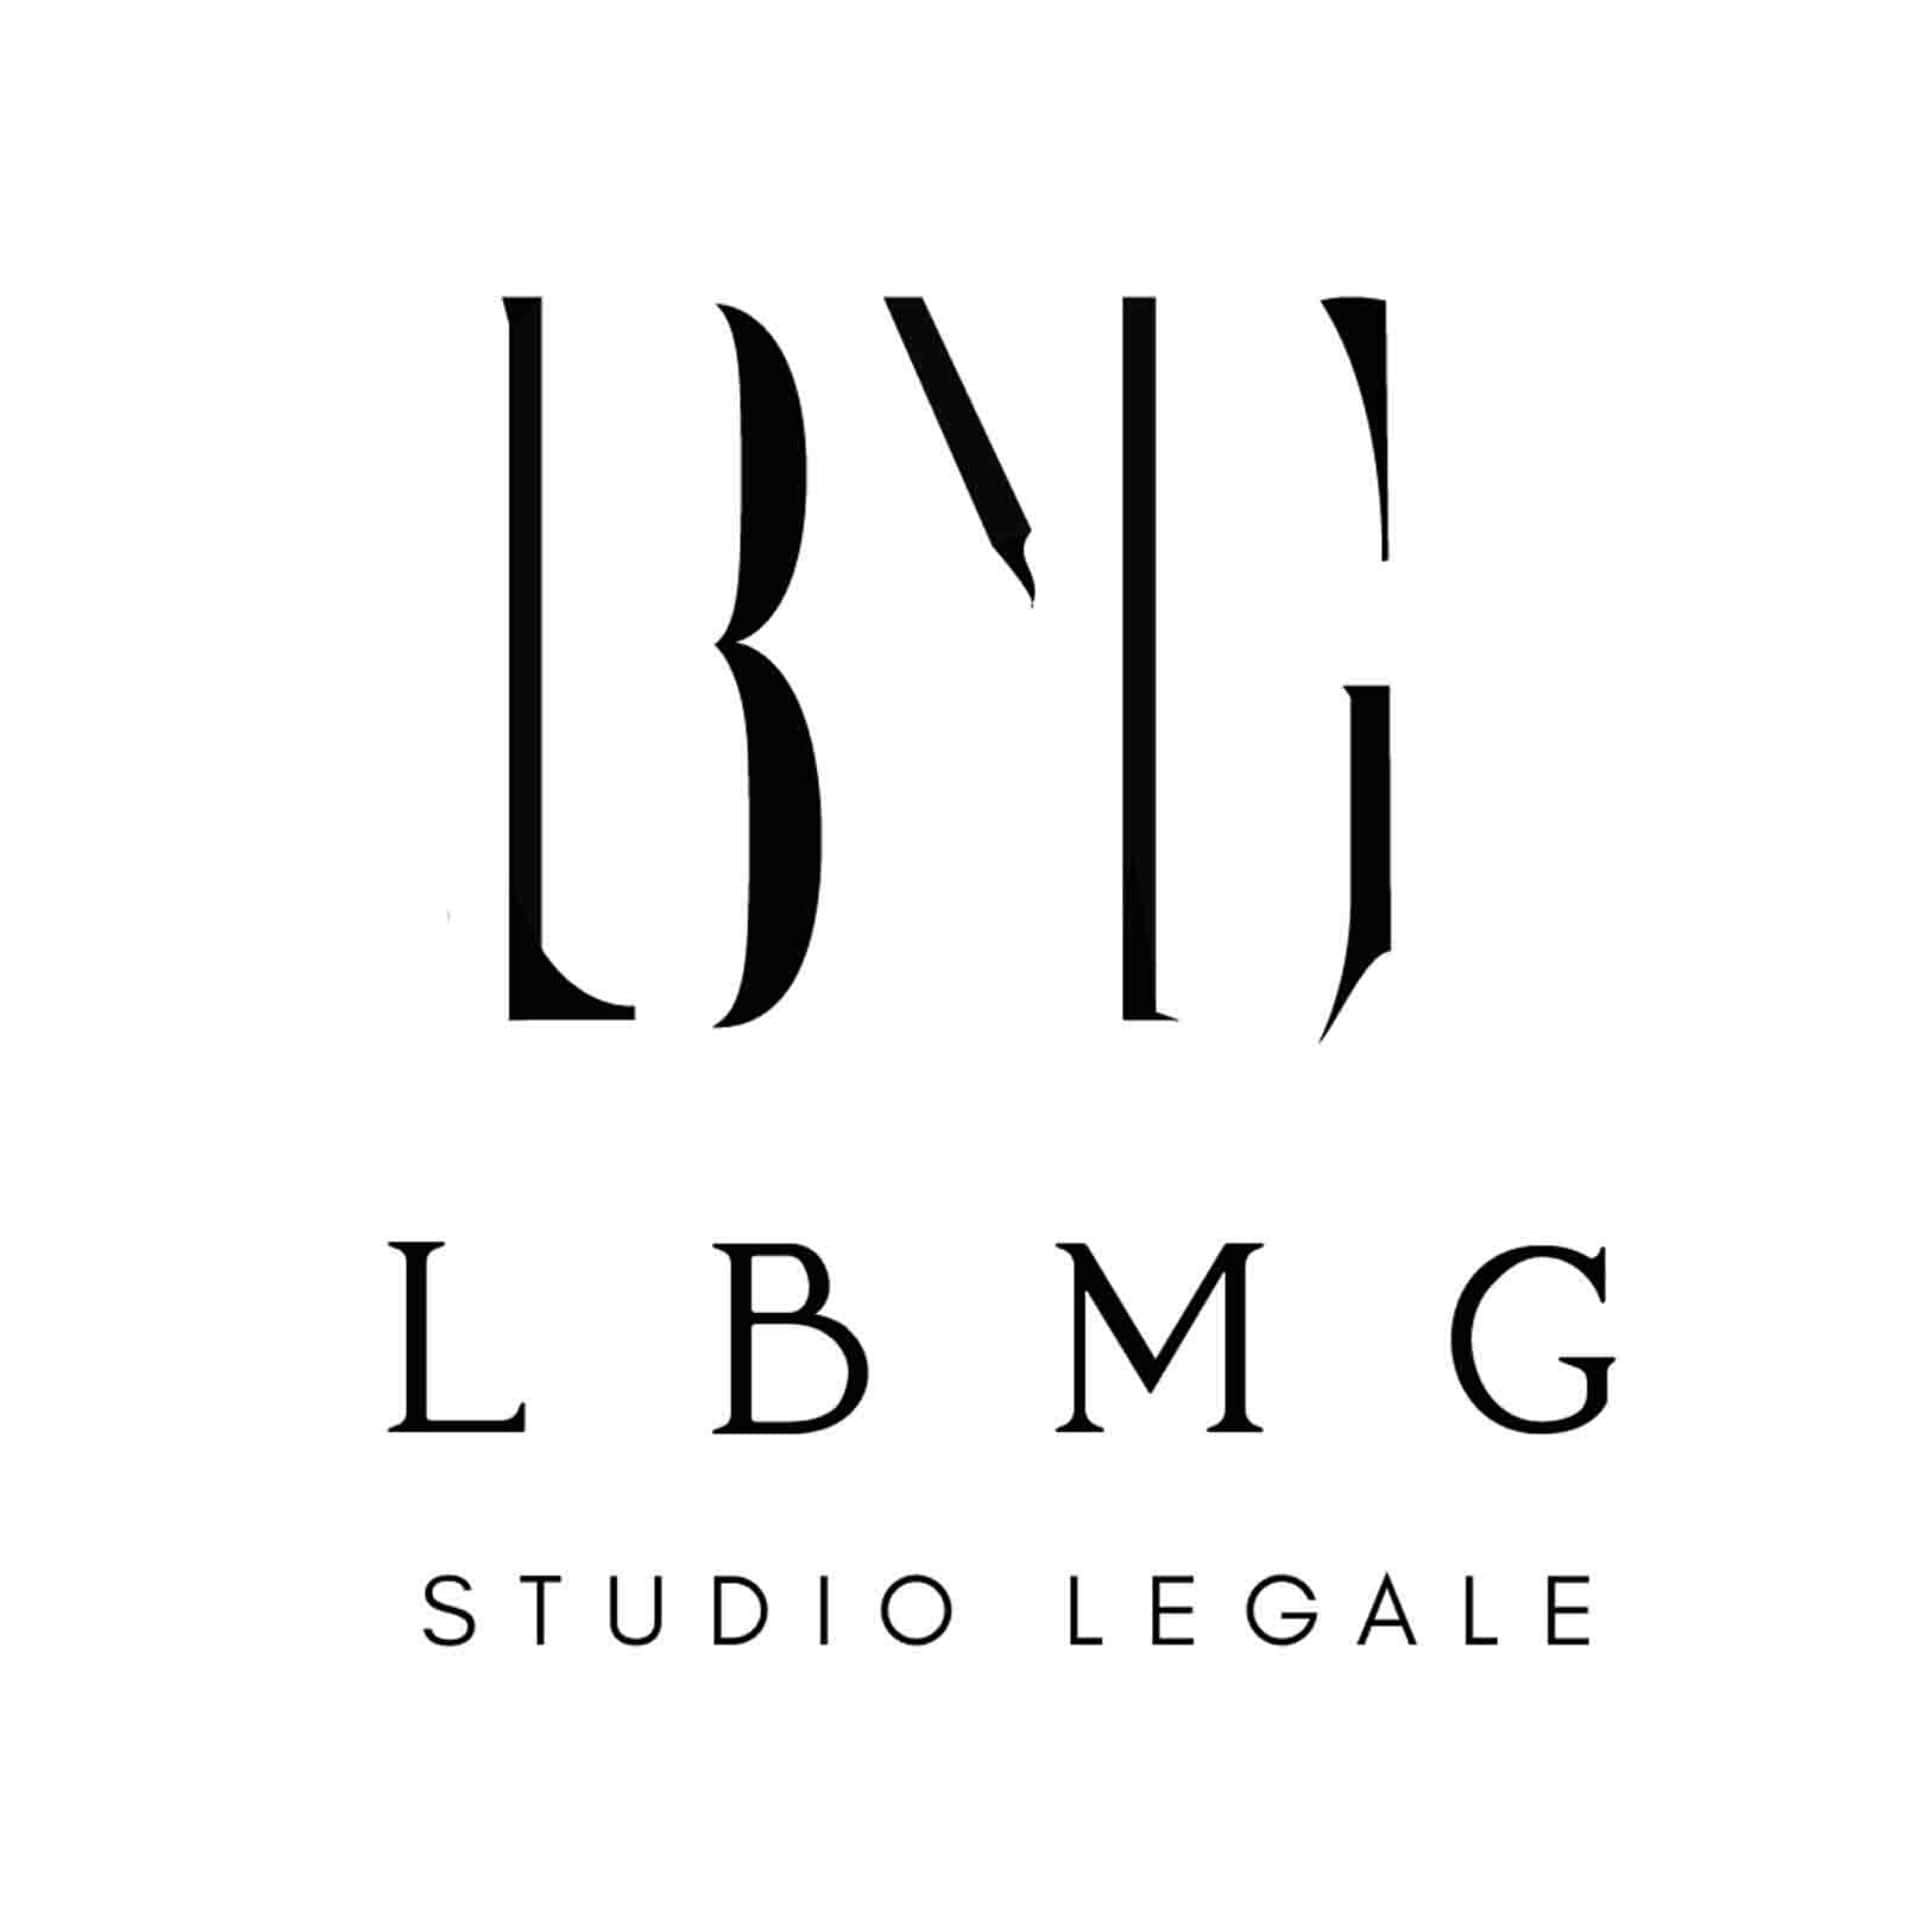 logo studio legale lbmg